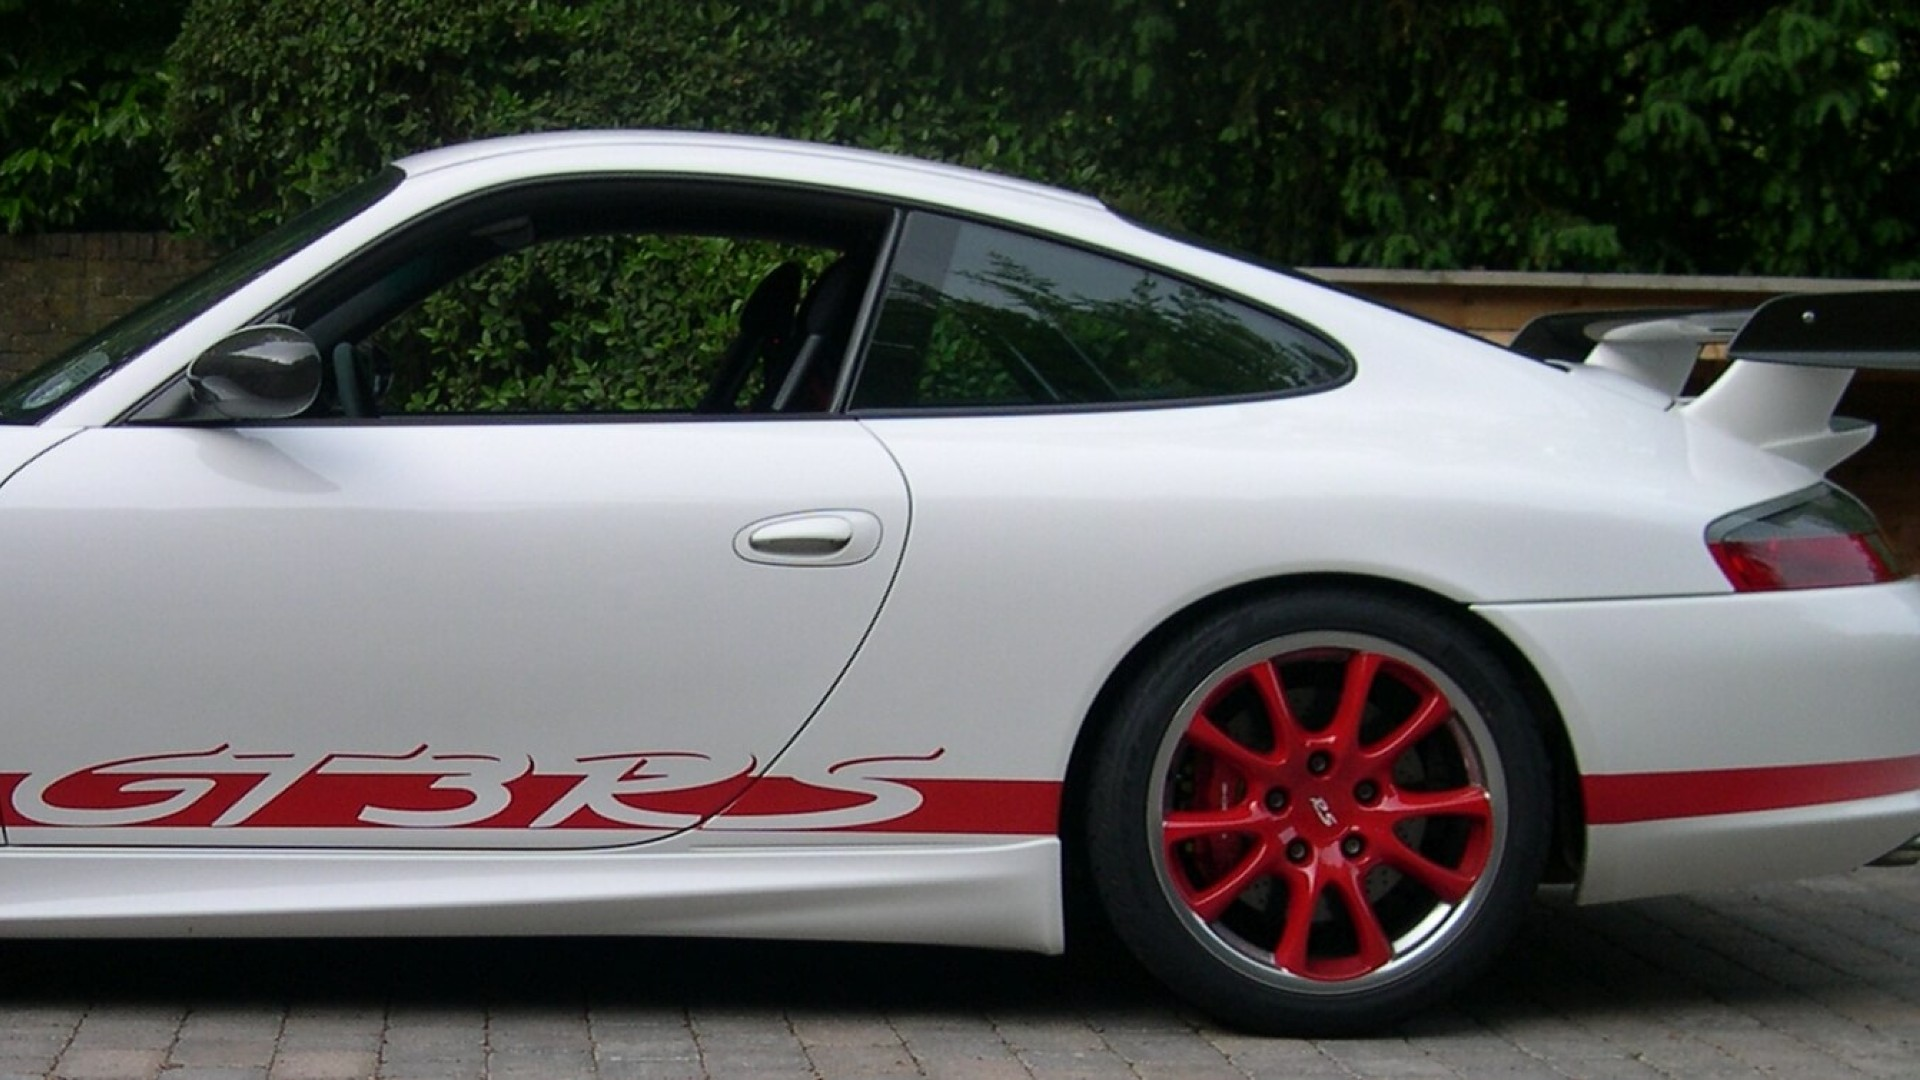 Porsche 911 Insurance Header Image